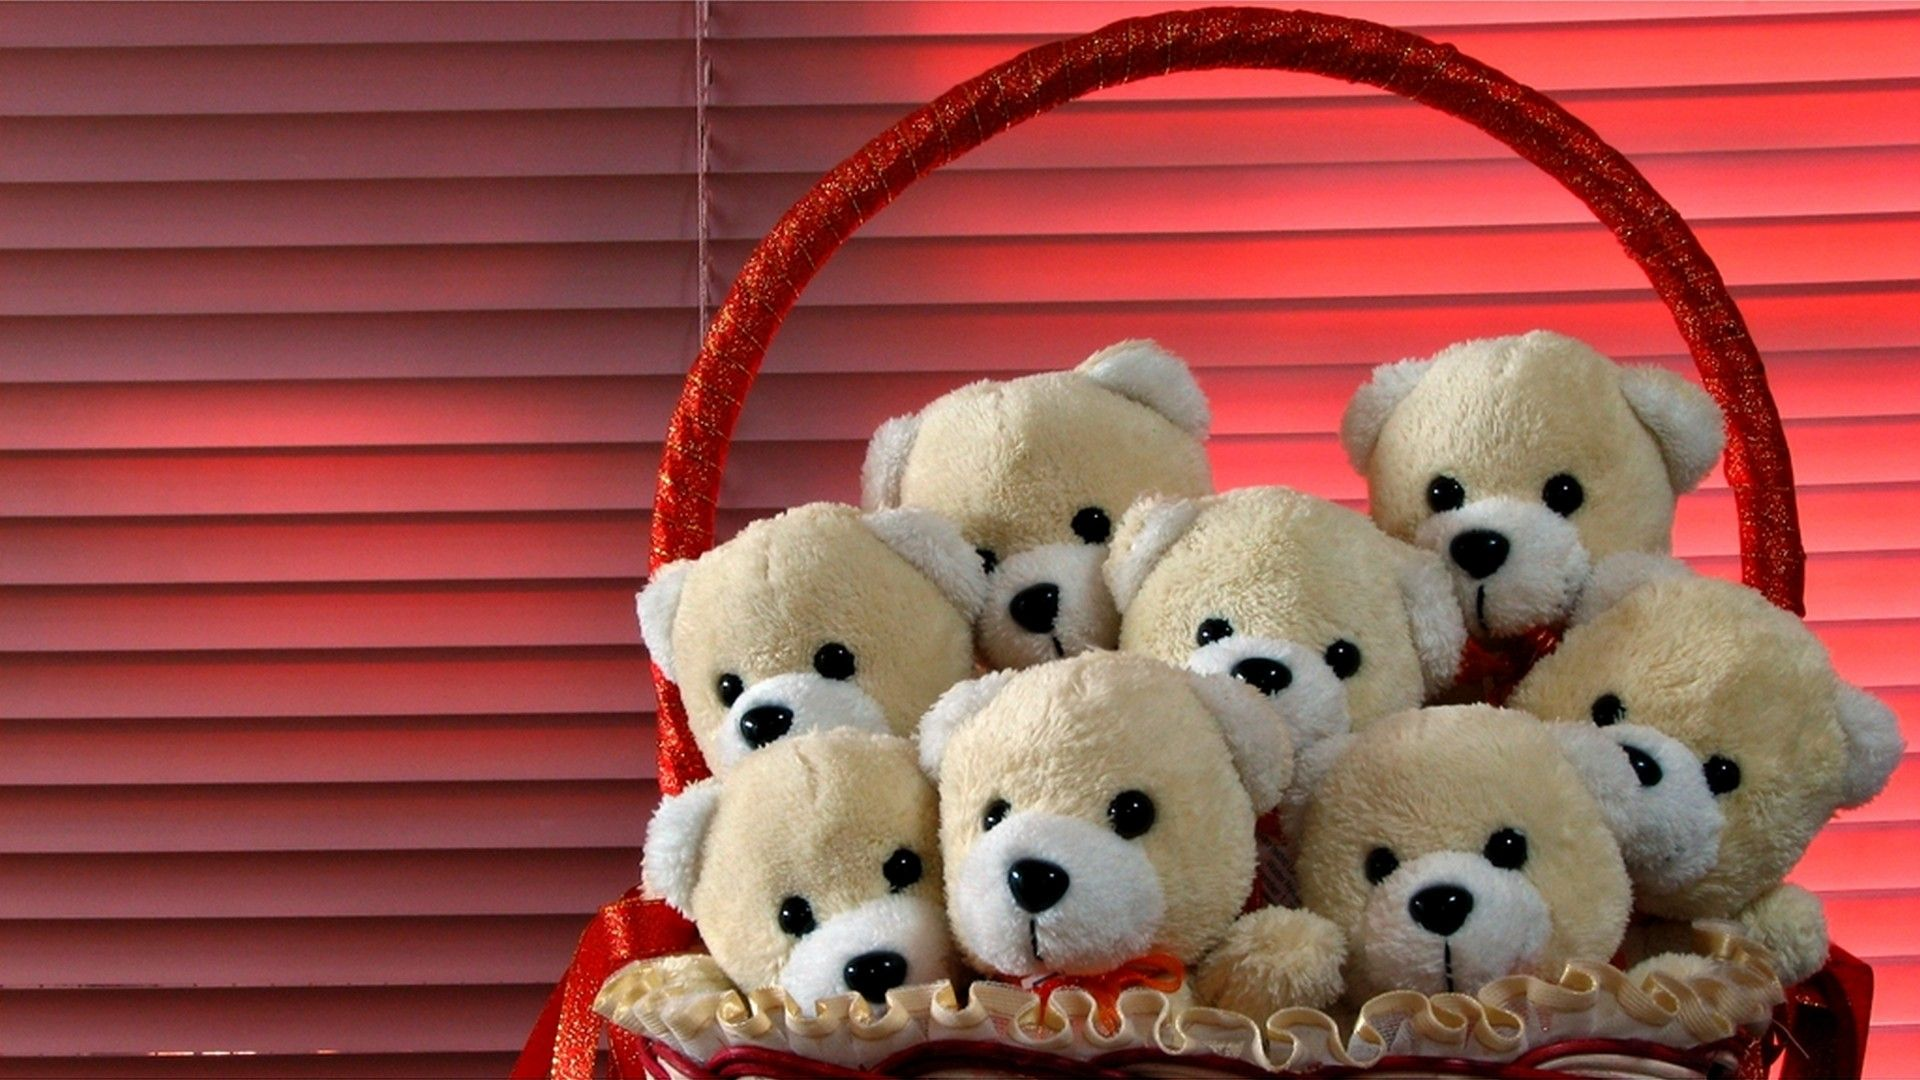 Pin Oleh Cheezusu Di 1d Beruang Teddy Boneka Binatang Wallpaper Ponsel Lucu